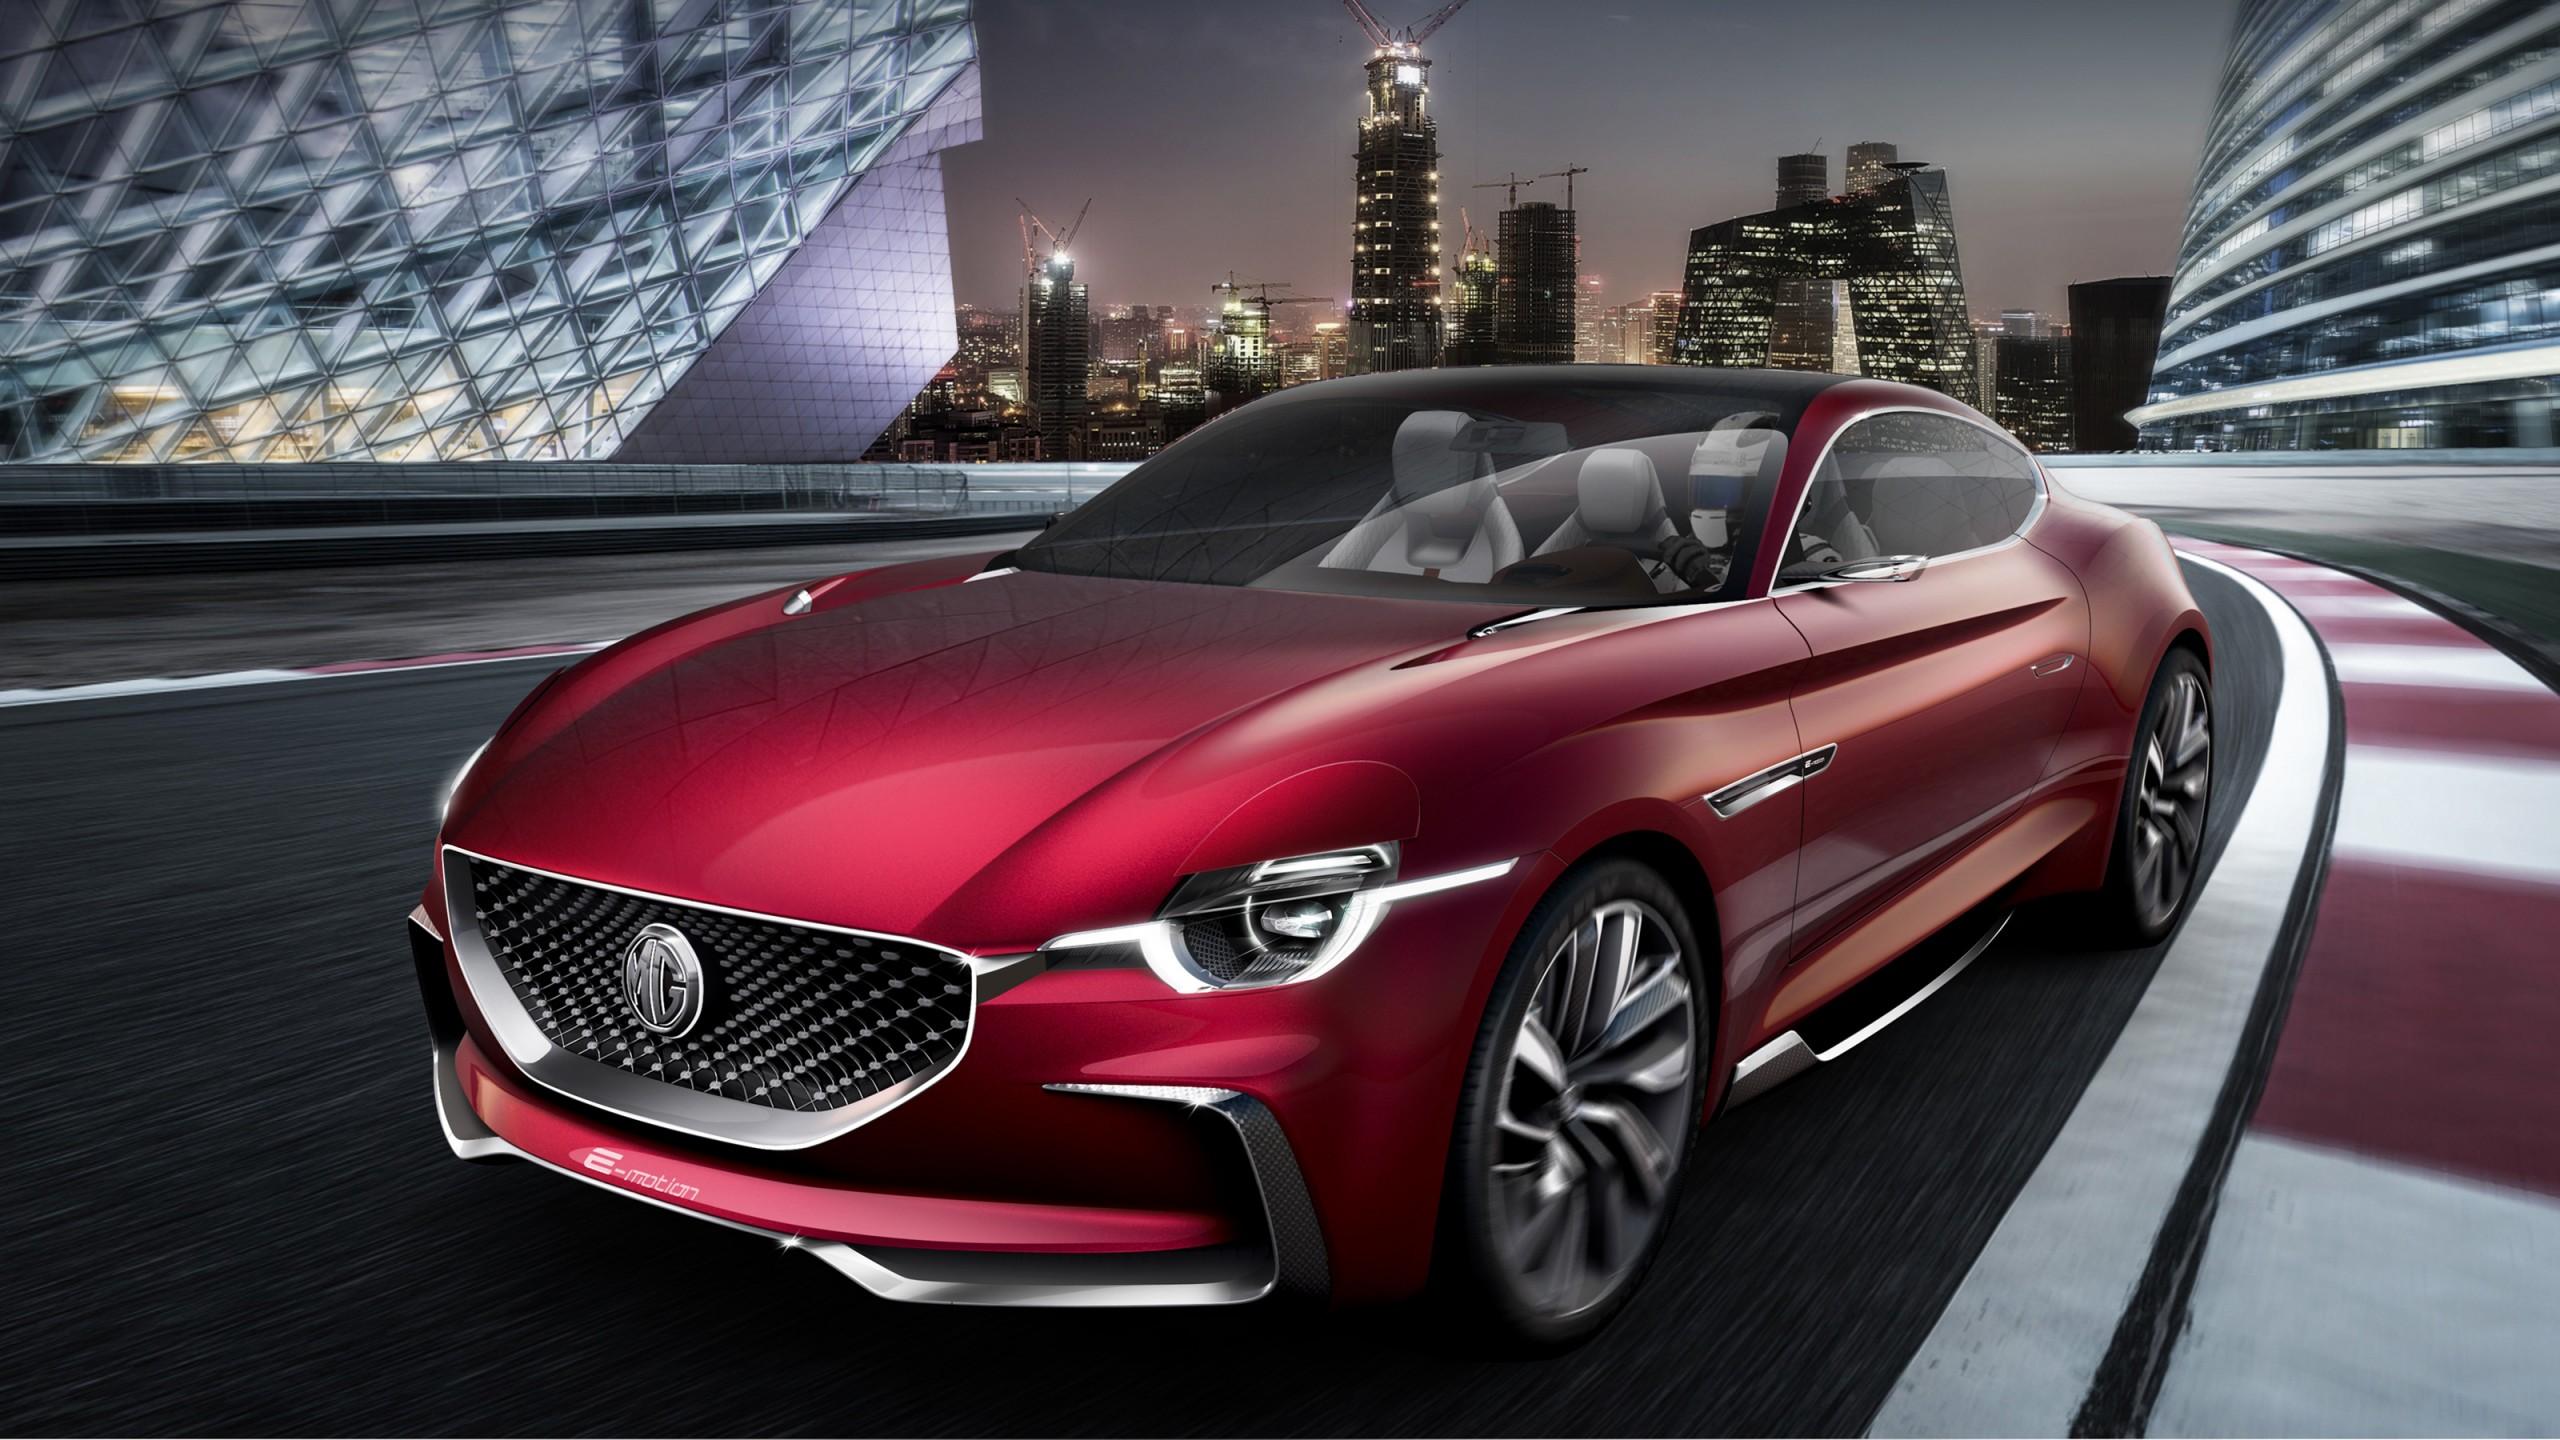 Mg e motion concept car wallpaper hd car wallpapers id - Future cars hd wallpapers ...